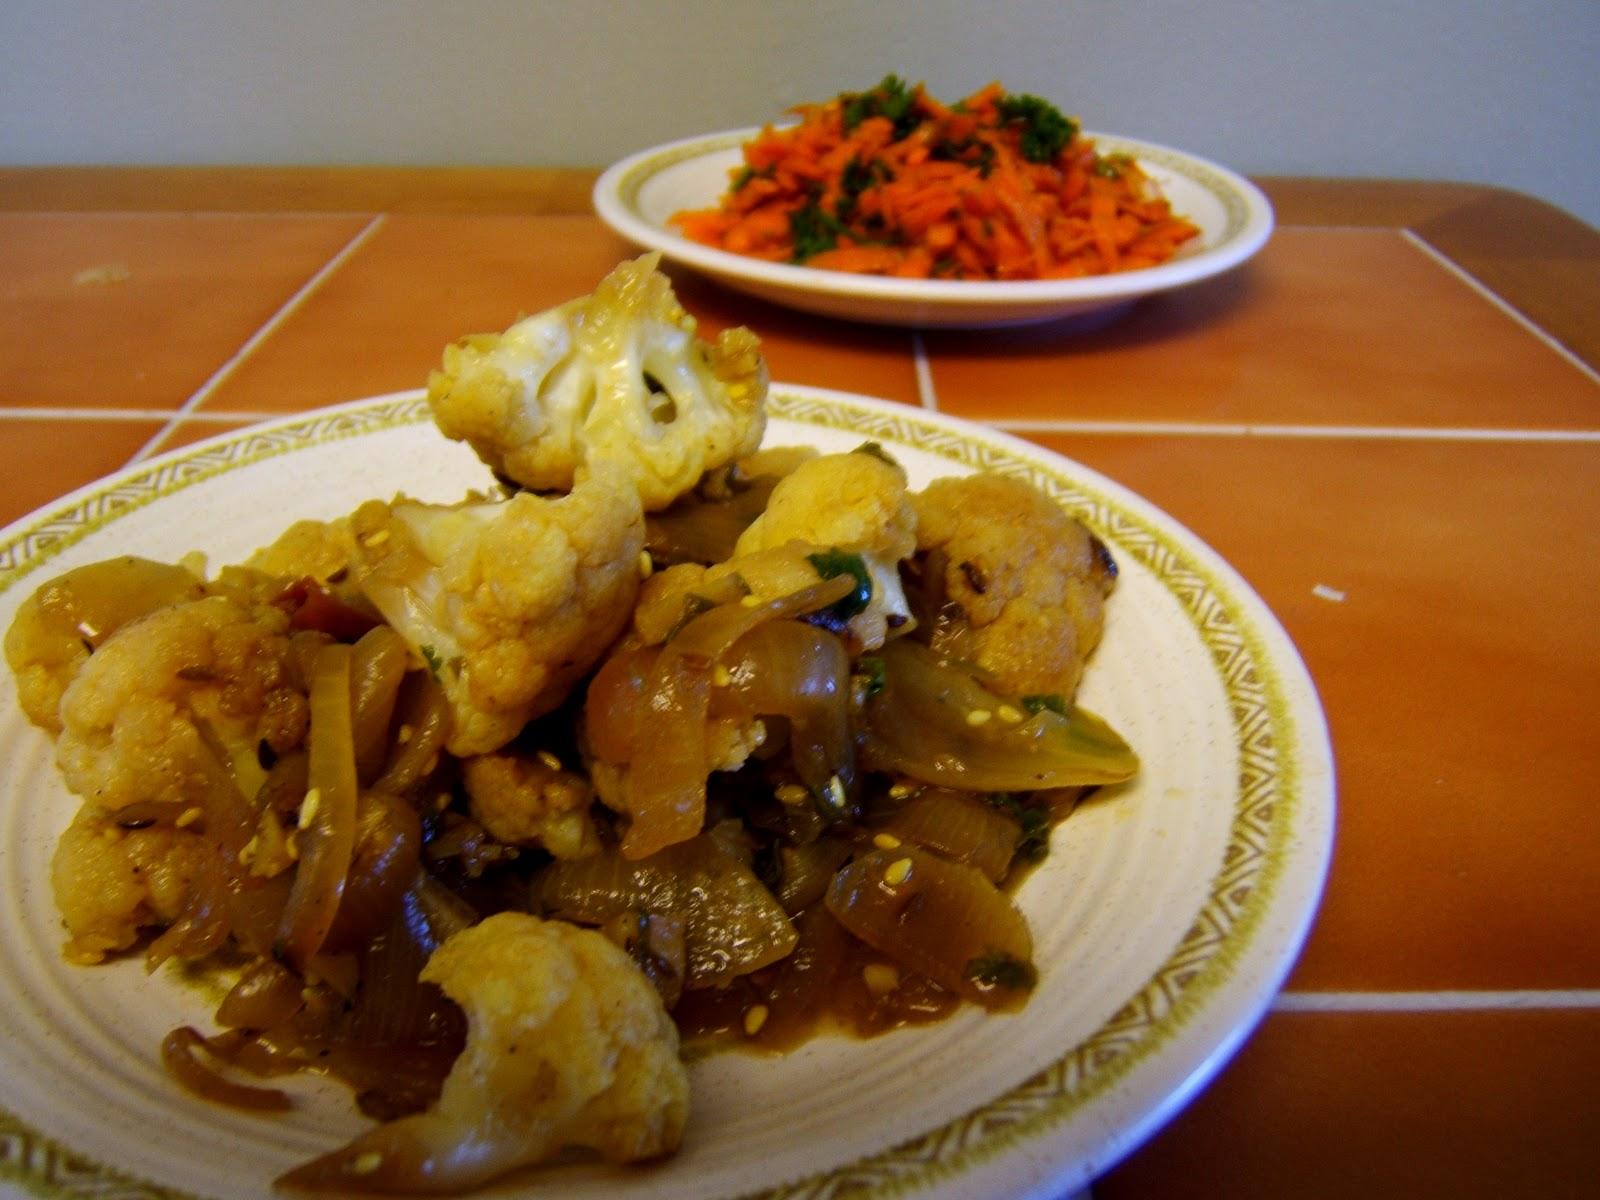 Spiced Cauliflower with Sesame Seeds